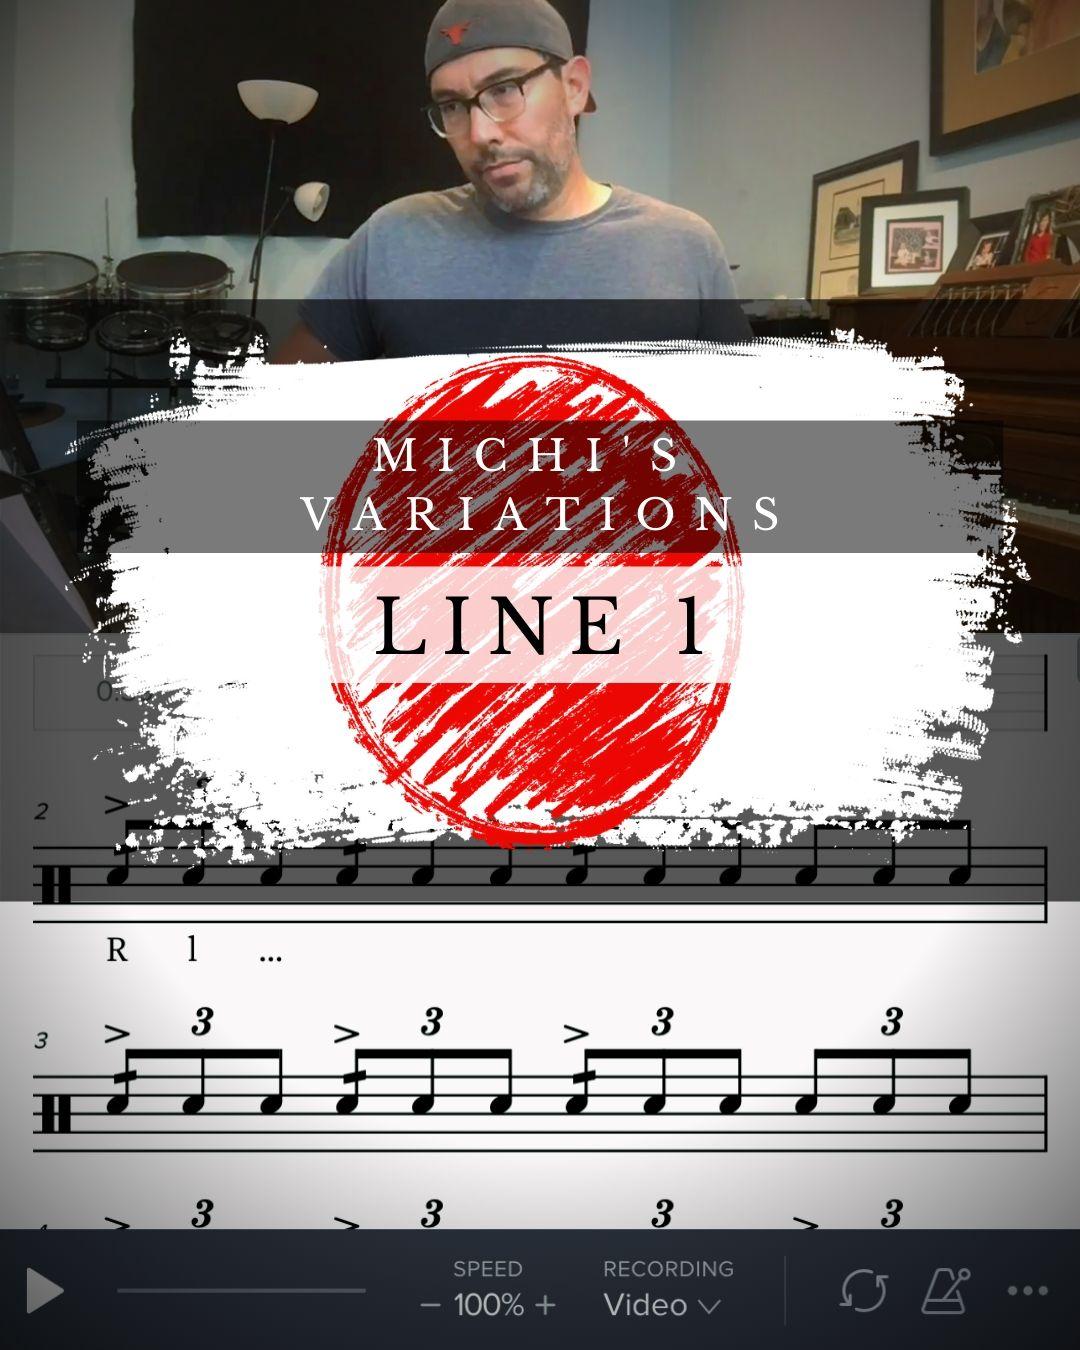 Michi's Variations Line 1